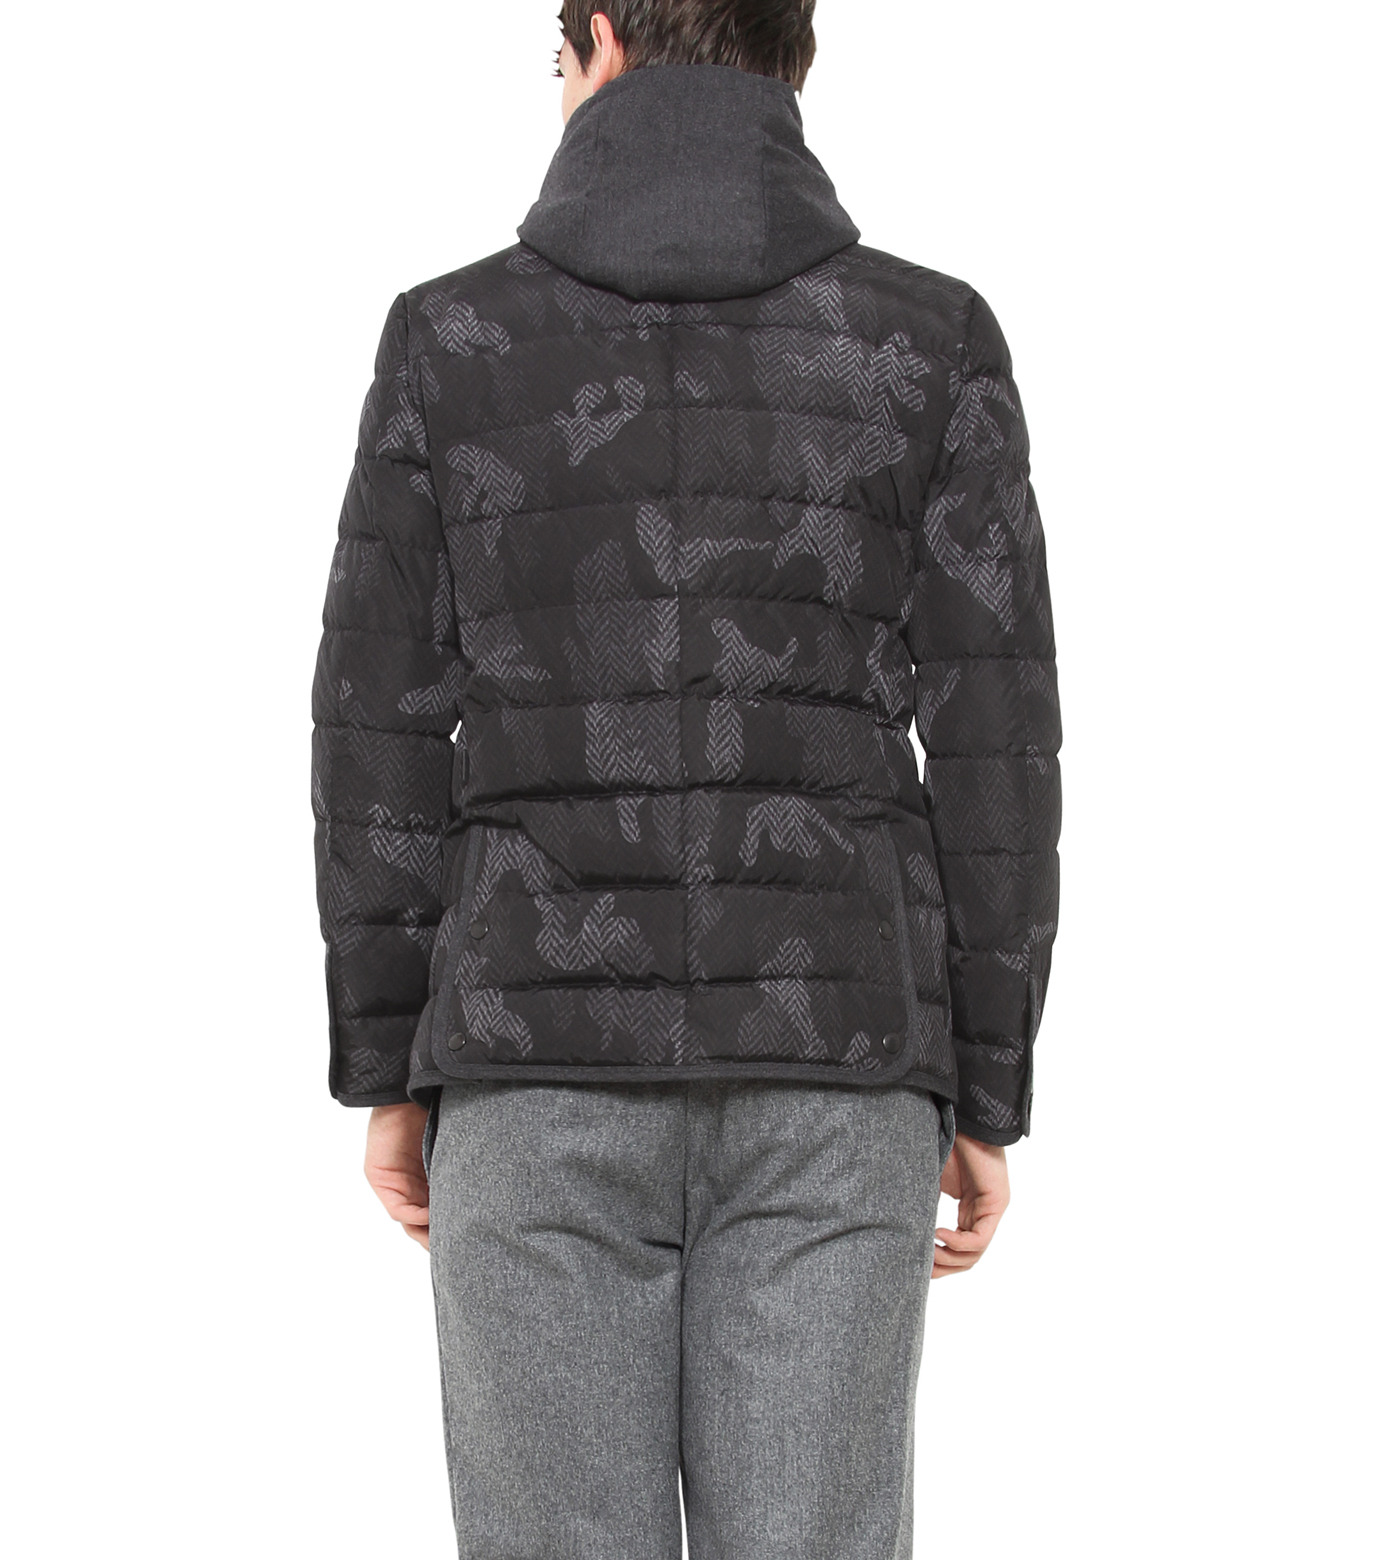 Moncler(モンクレール)のROCHER-CHARCHOL GRAY(ジャケット/jacket)-309558053710-12 拡大詳細画像2